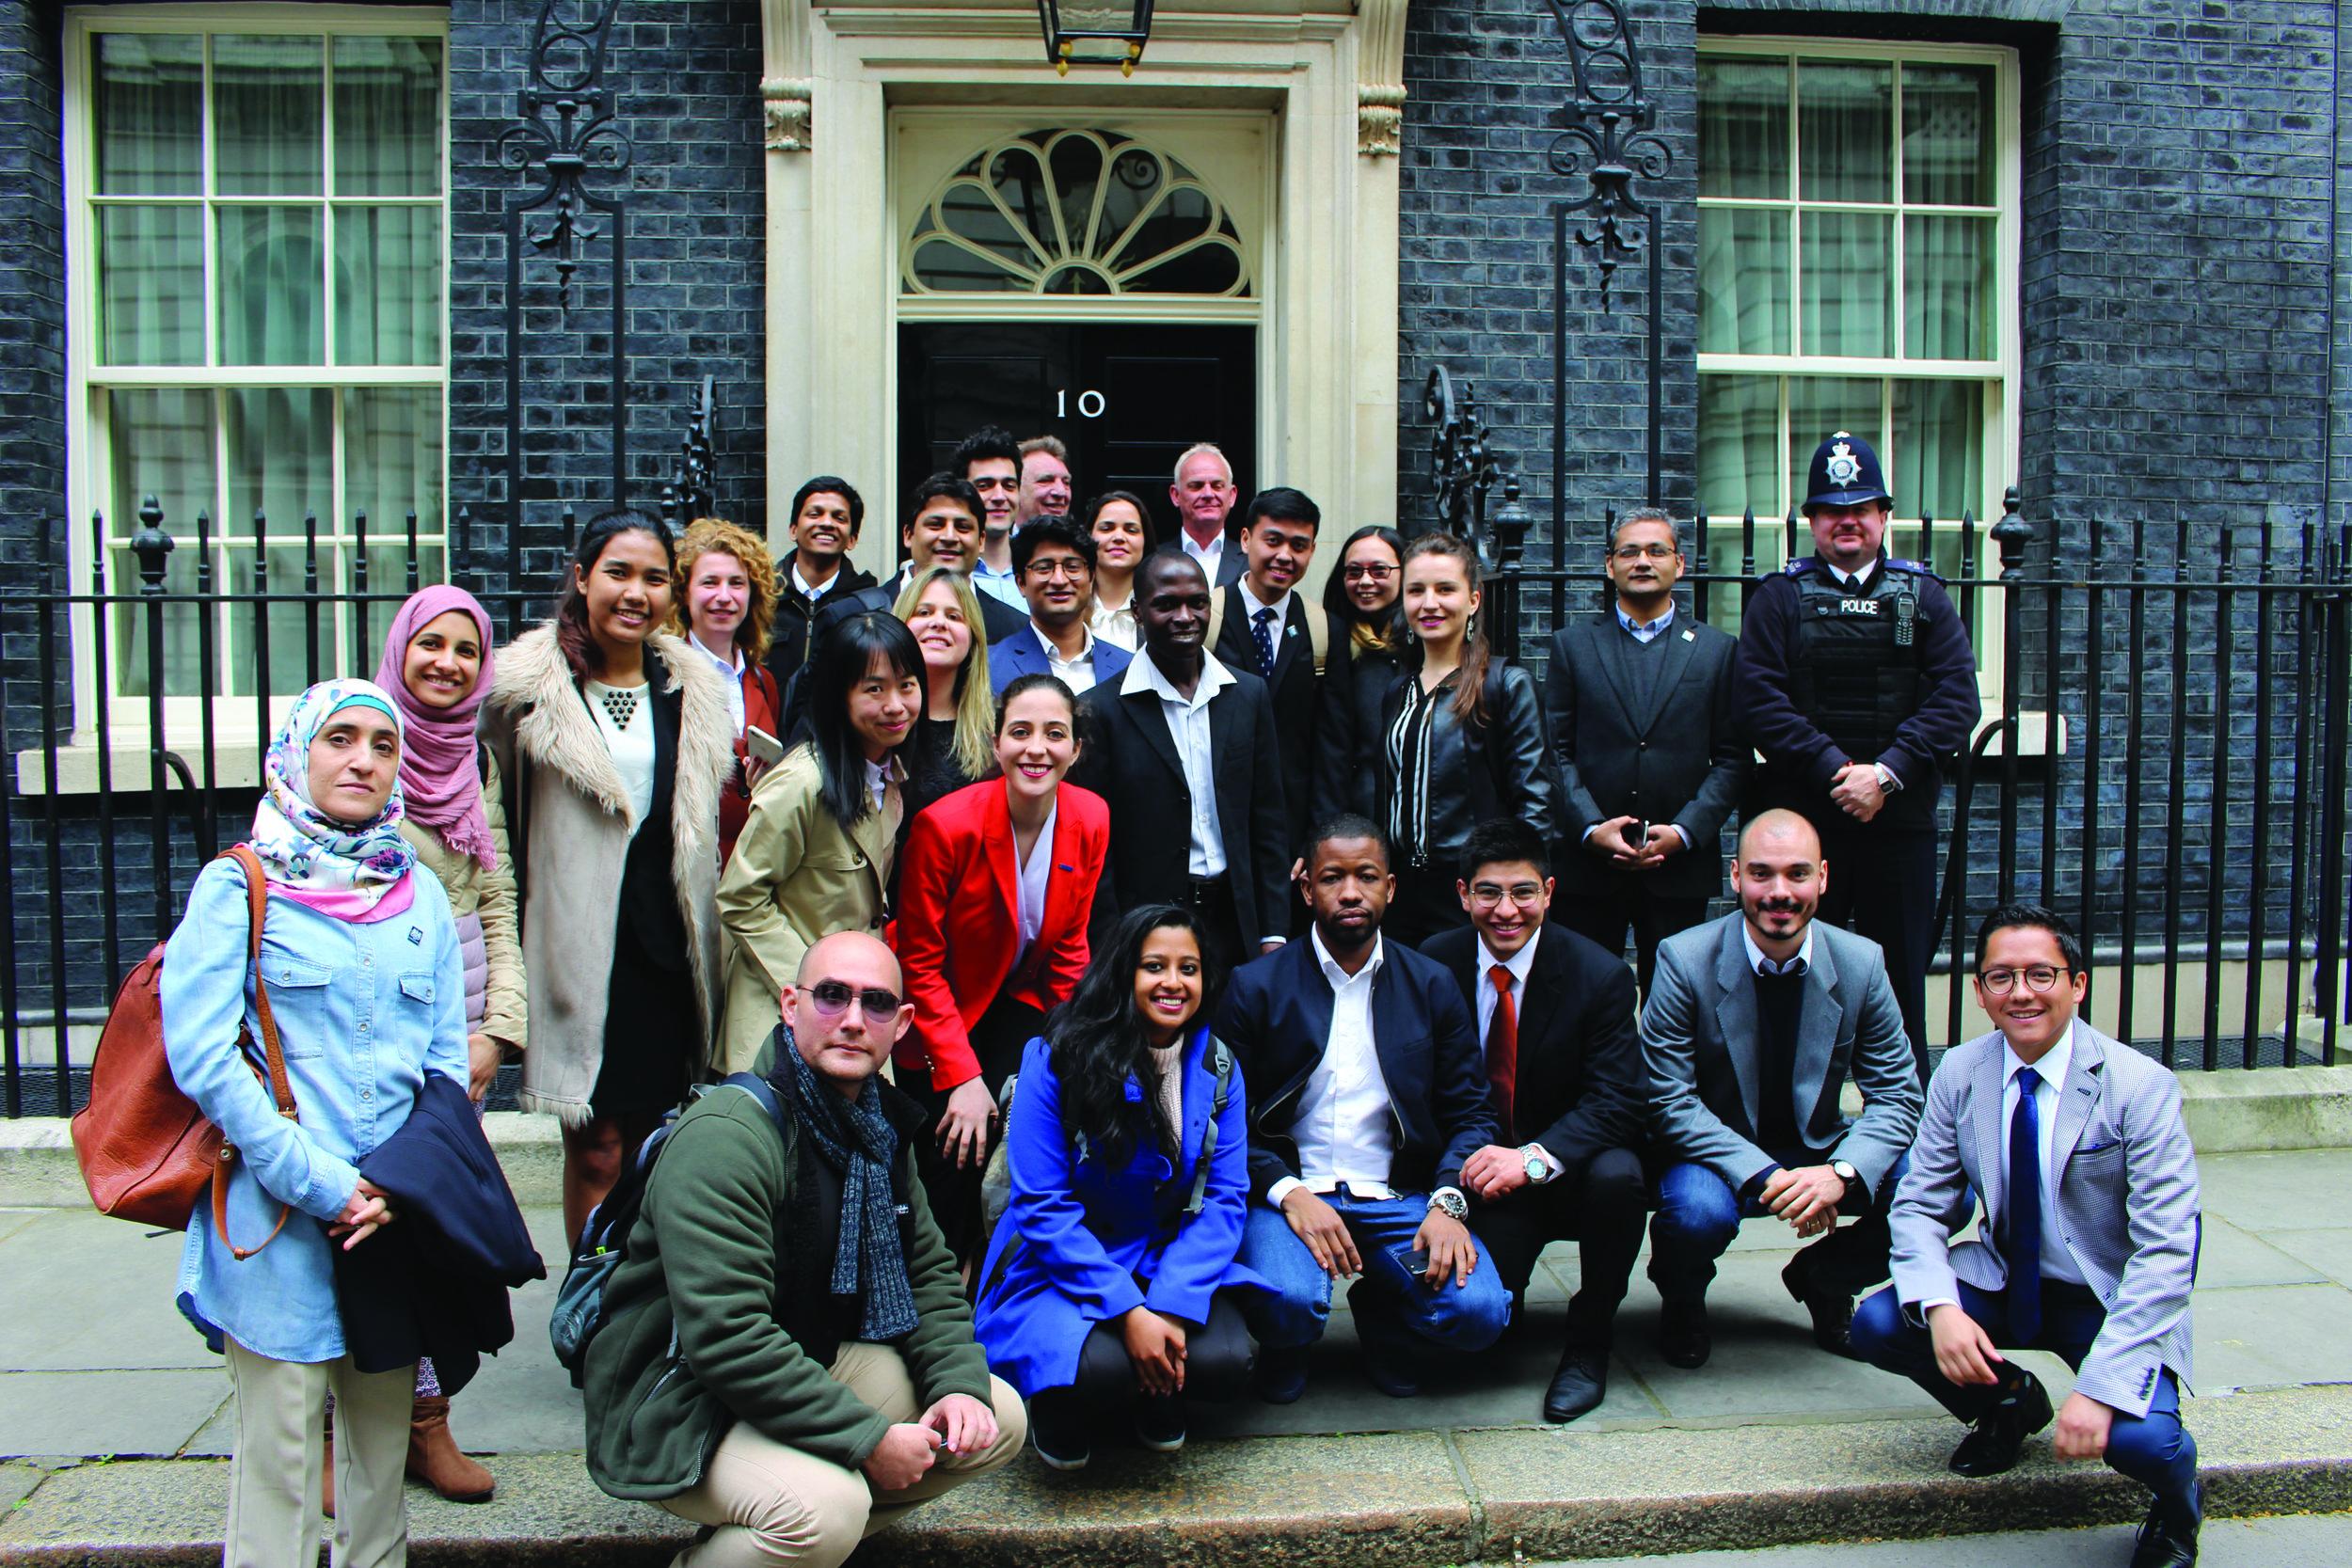 Generic - Scholars outside No 10 (mmff).jpg